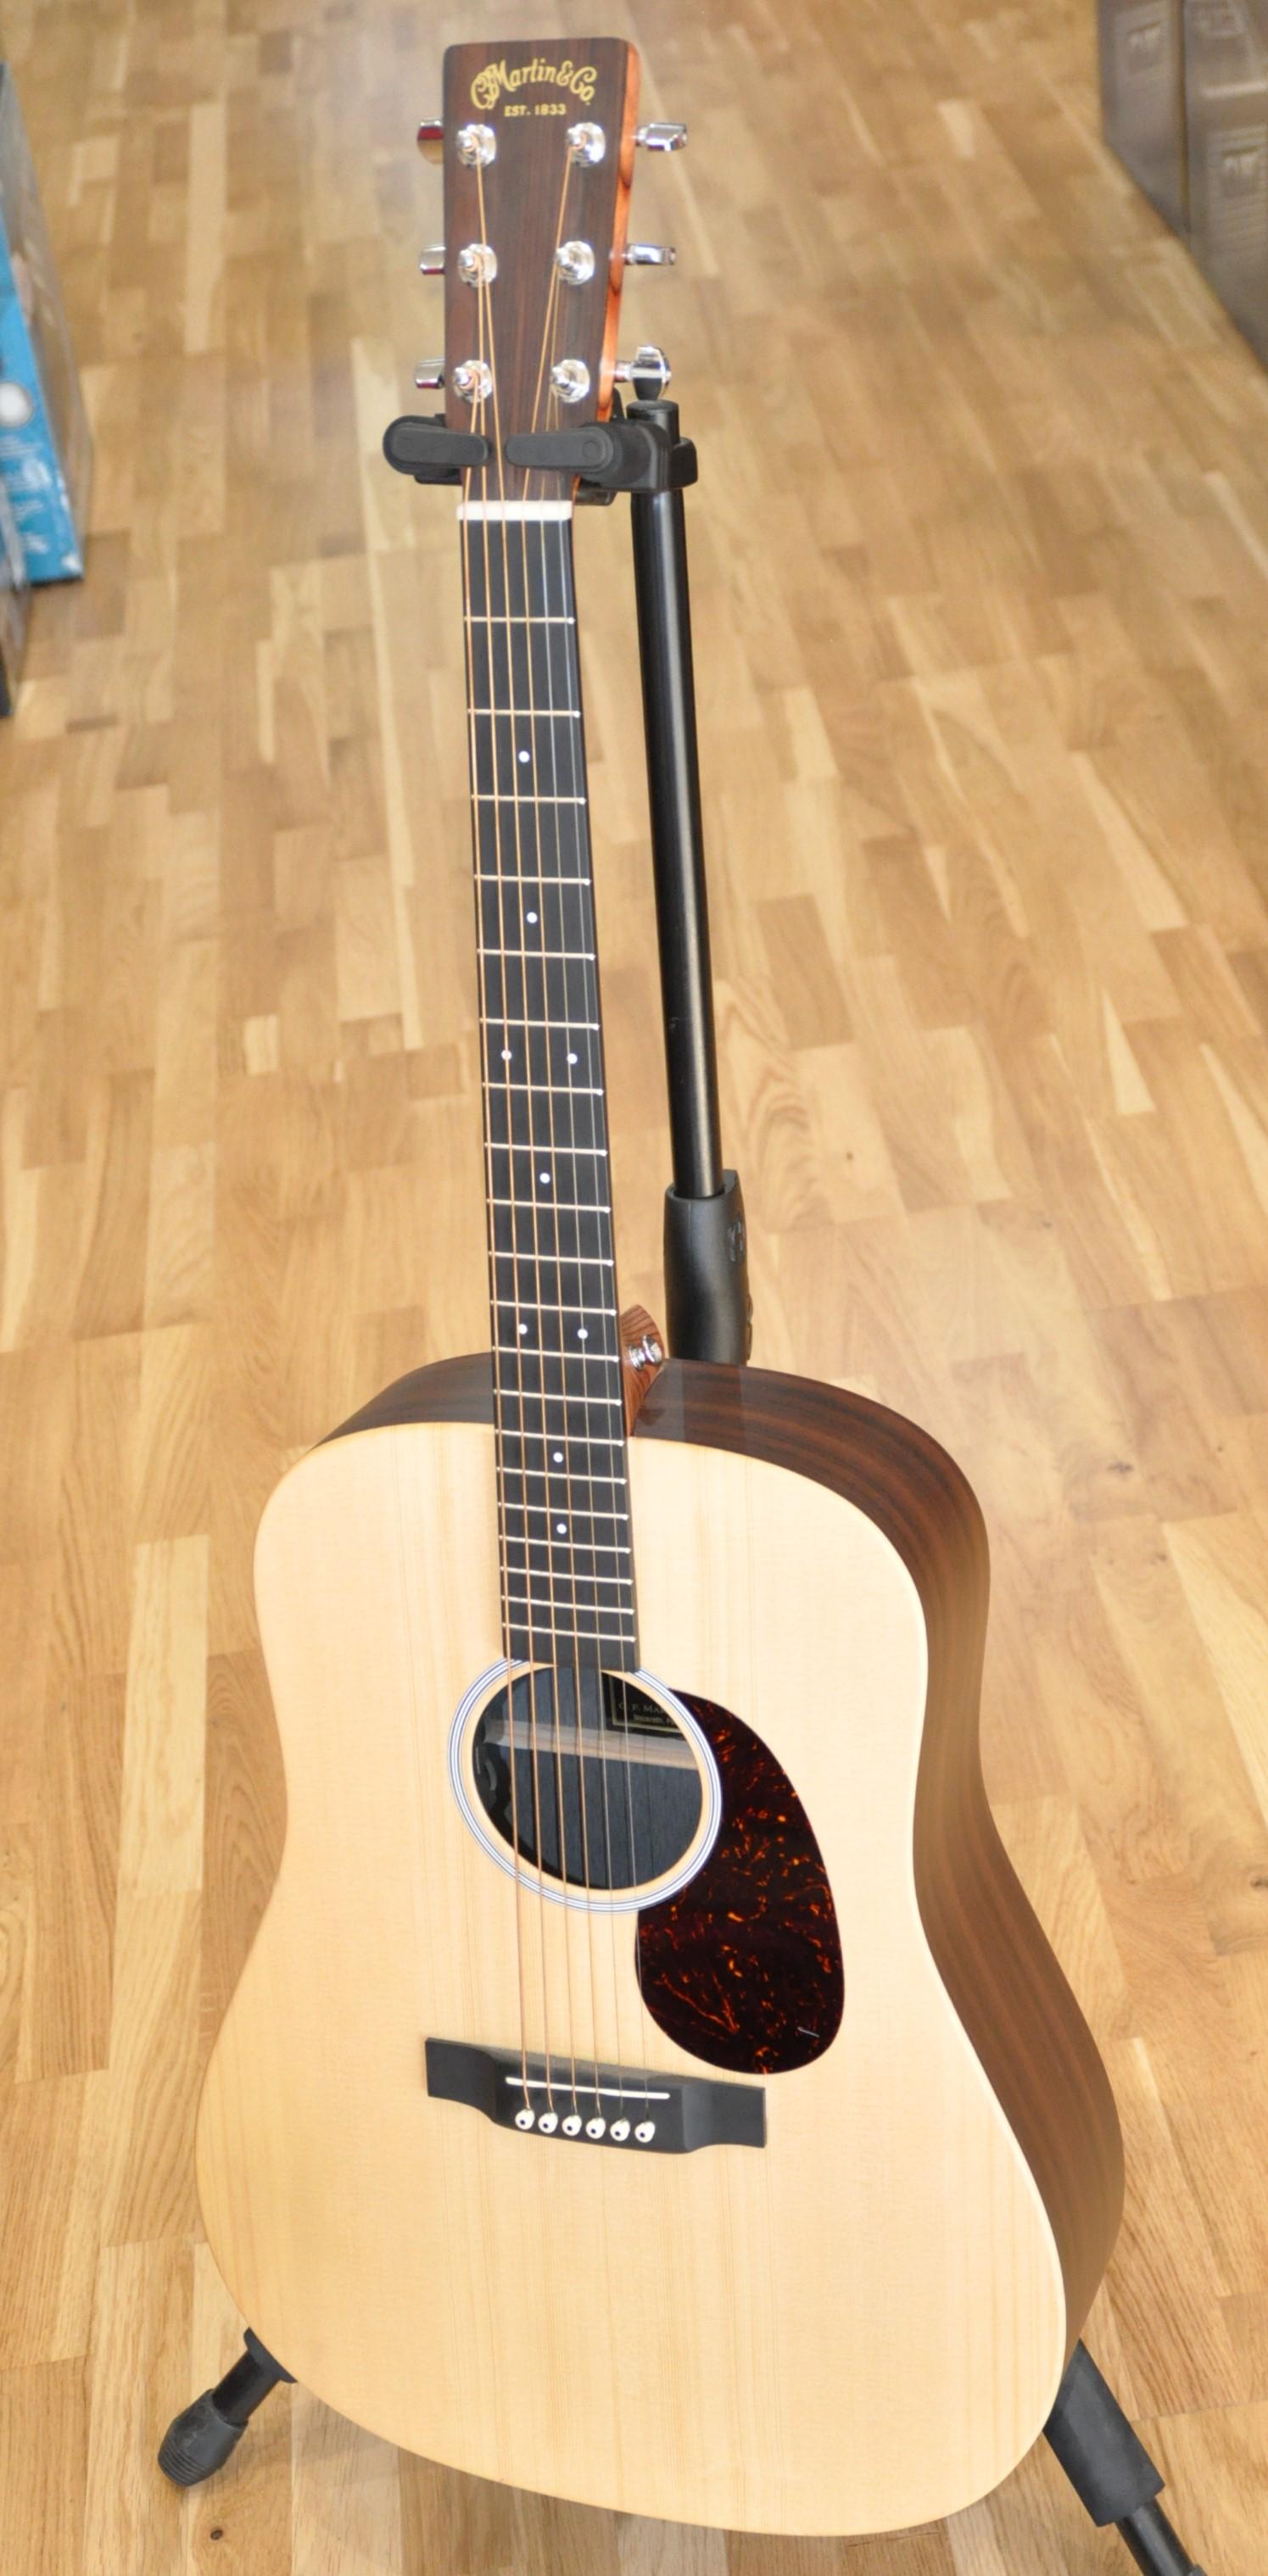 guitare electroacoustique martin co dx1rae ile de. Black Bedroom Furniture Sets. Home Design Ideas